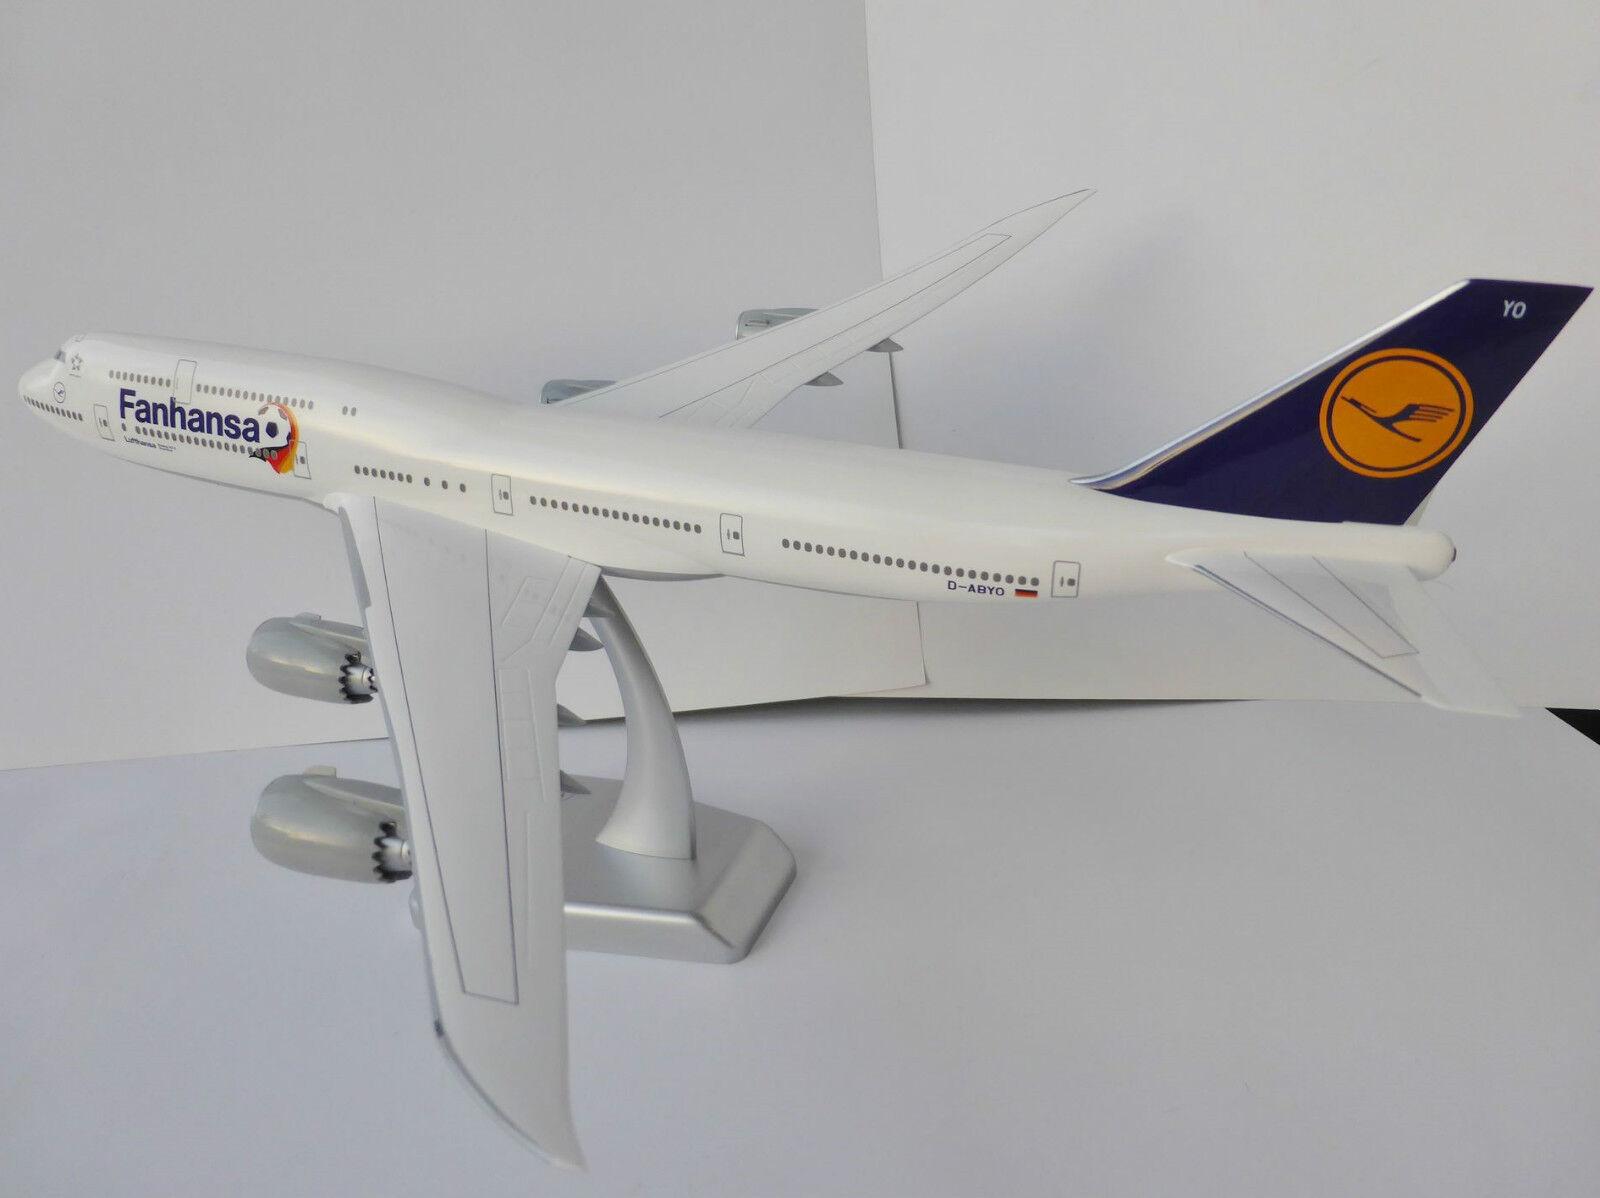 FANHANSA Boeing 747-8 747-8 747-8 LUFTHANSA 1 200 Limox Wings LH30 747 D-ABYO Saarland WM 22bda8